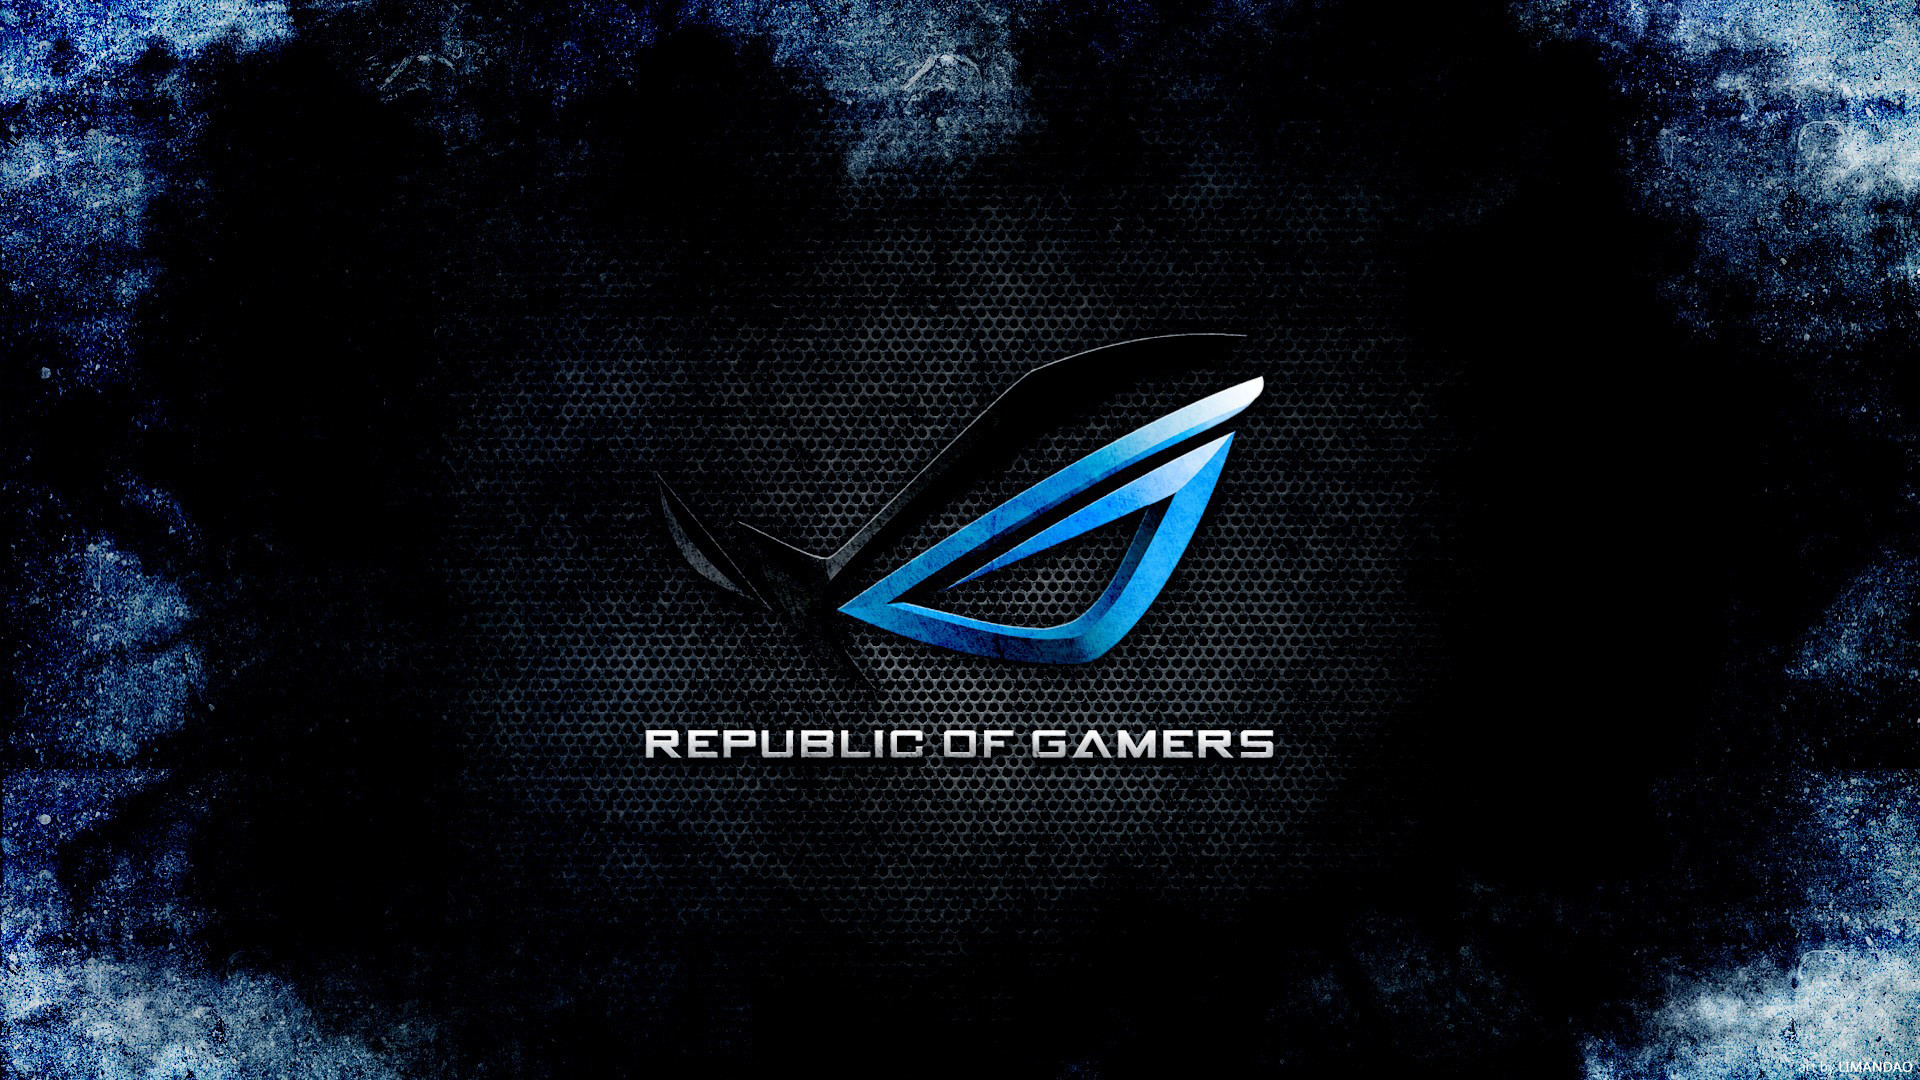 rog (republic of gamers) logo dark blue hd. 1080p wallpaper .